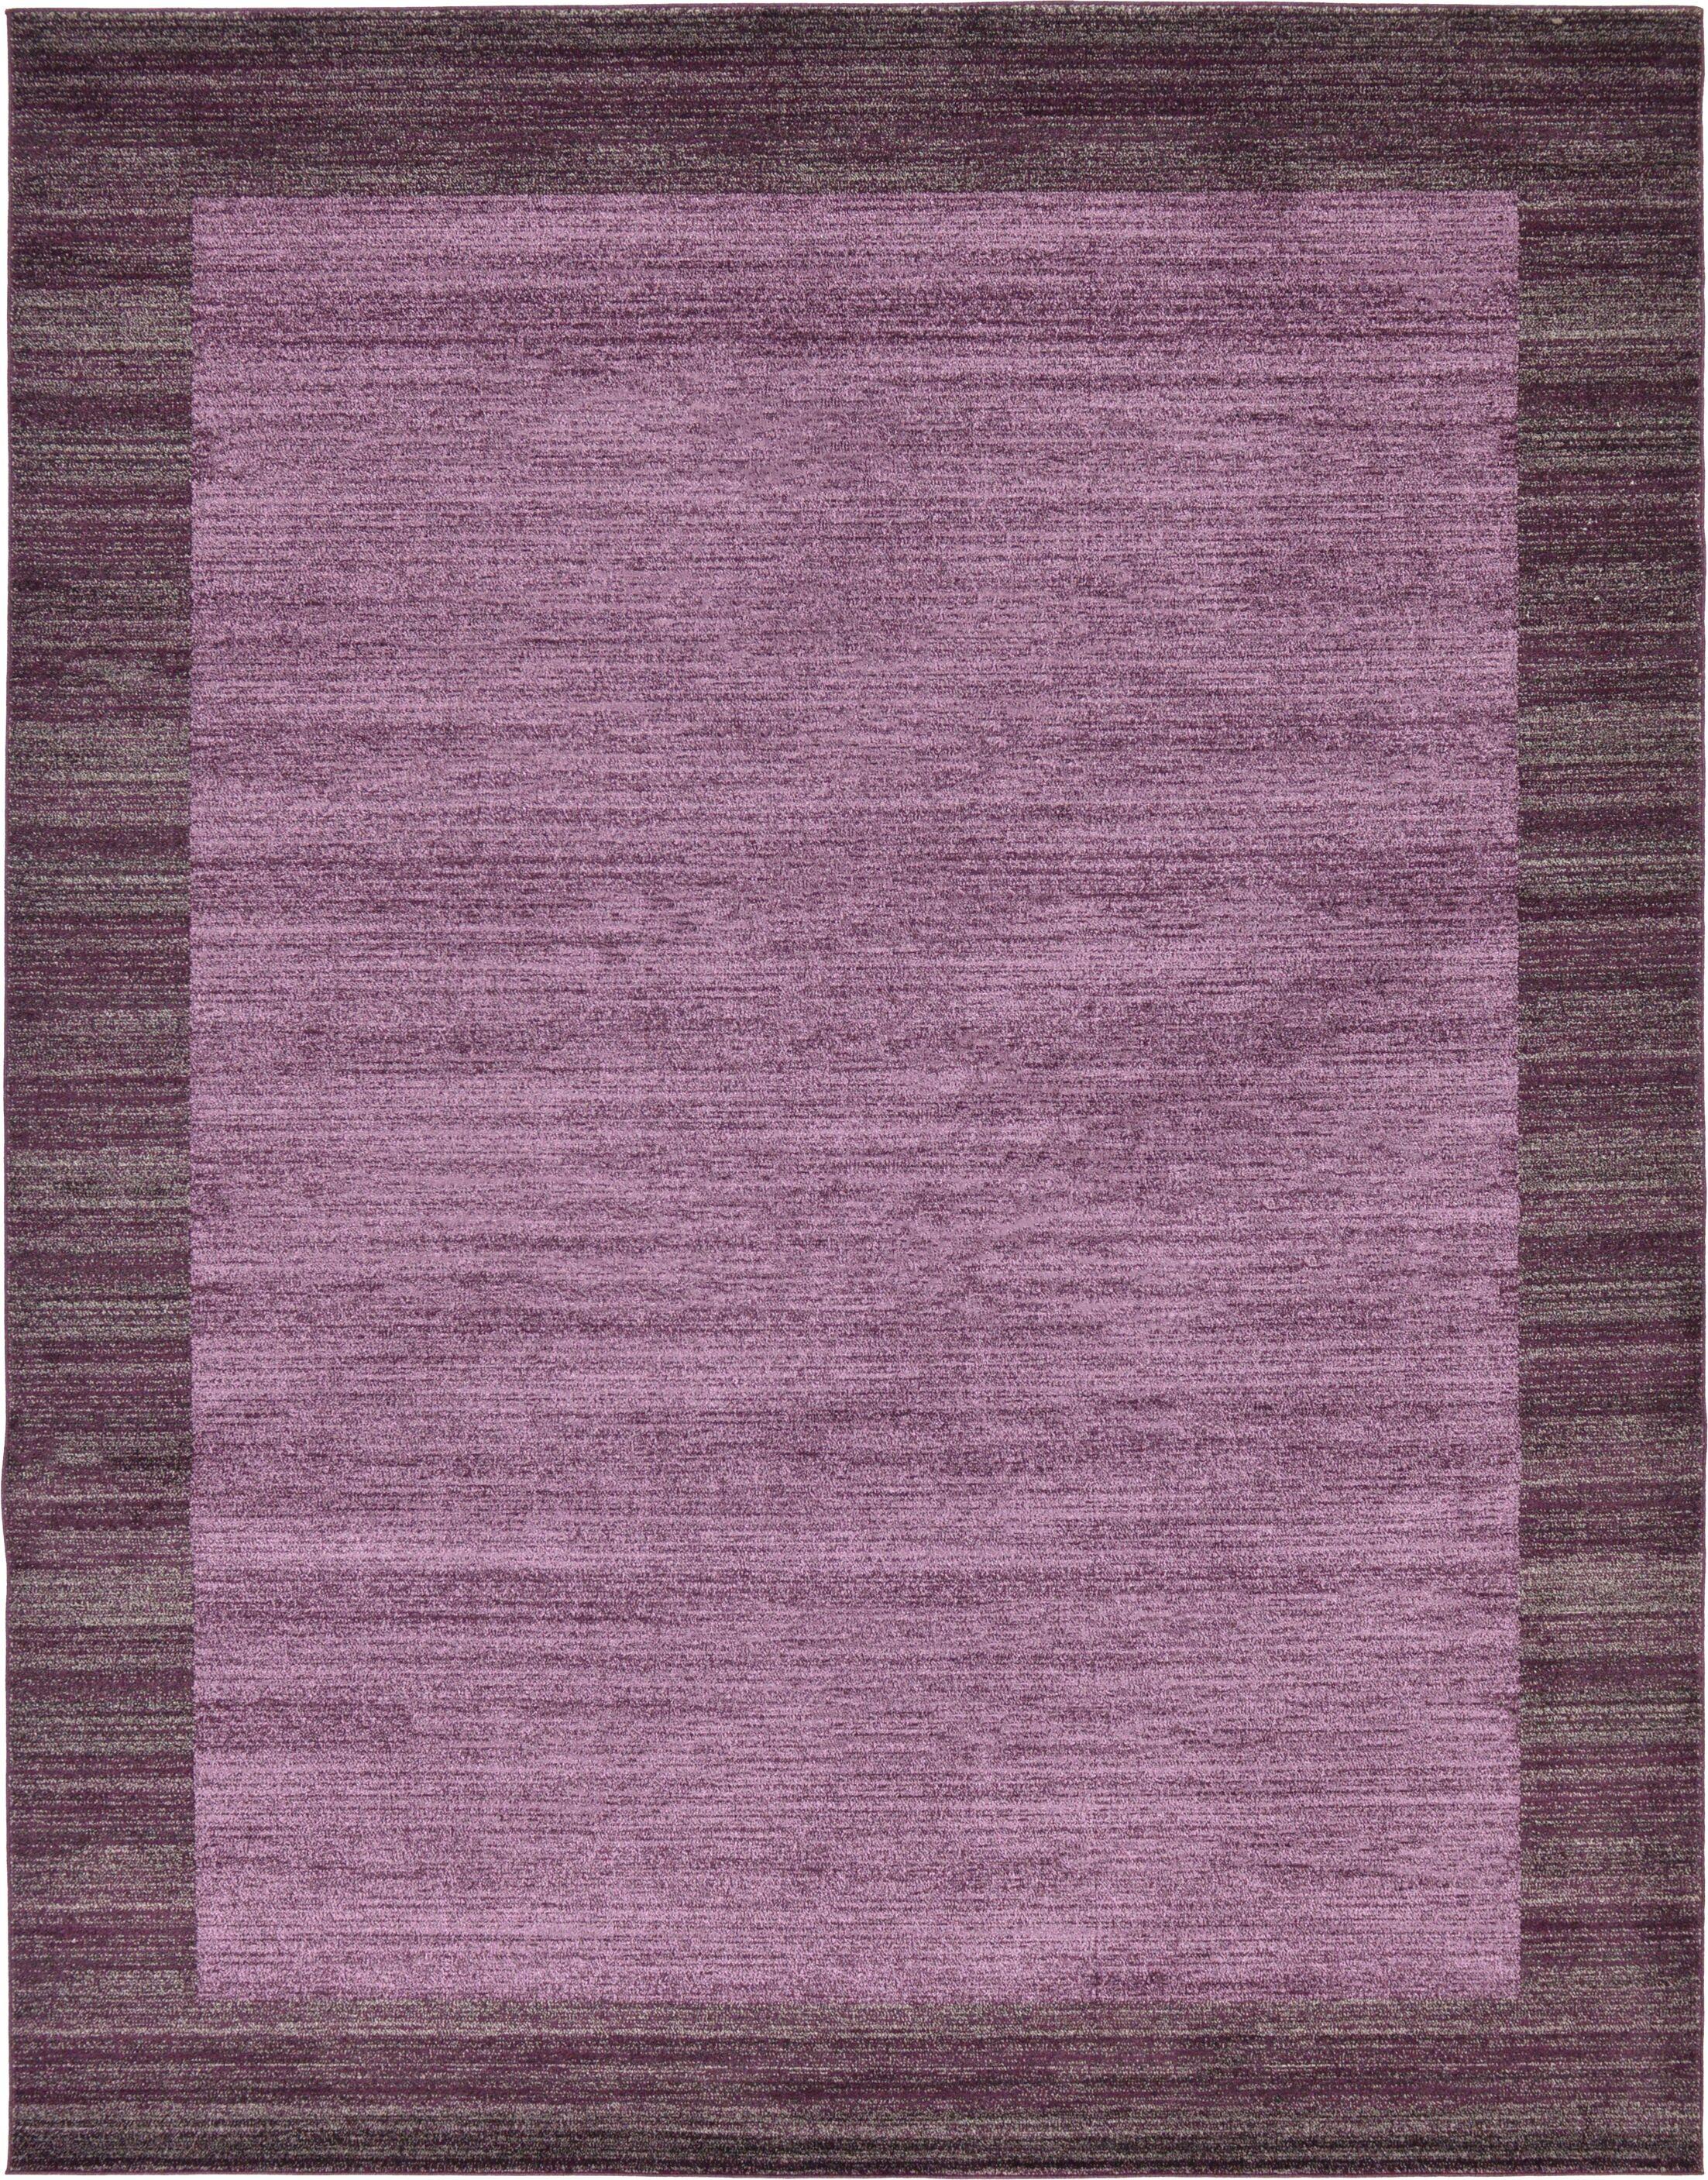 Christi Purple Color Bordered Area Rug Rug Size: Rectangle 10' x 13'